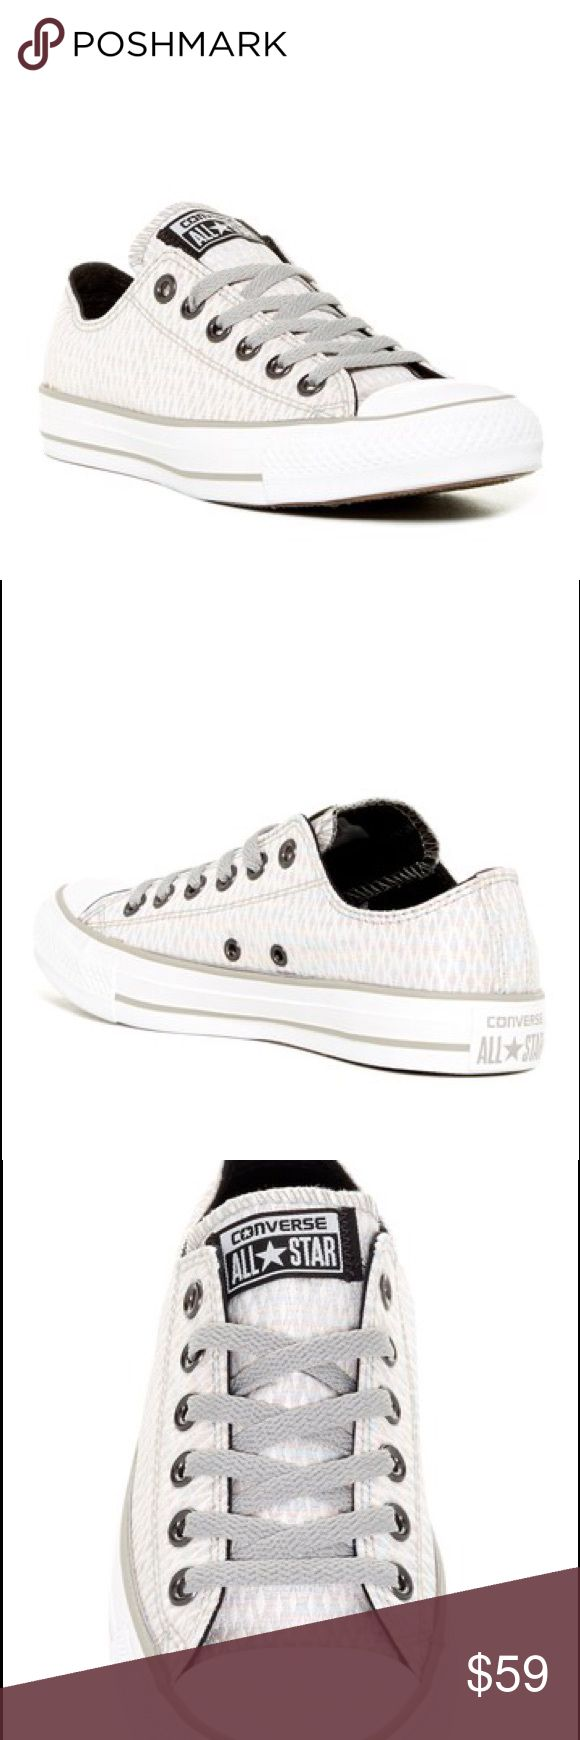 ☀️SALE! Converse Women Diamond Jacquard shoes Brand new size 10 womens Converse Shoes Sneakers